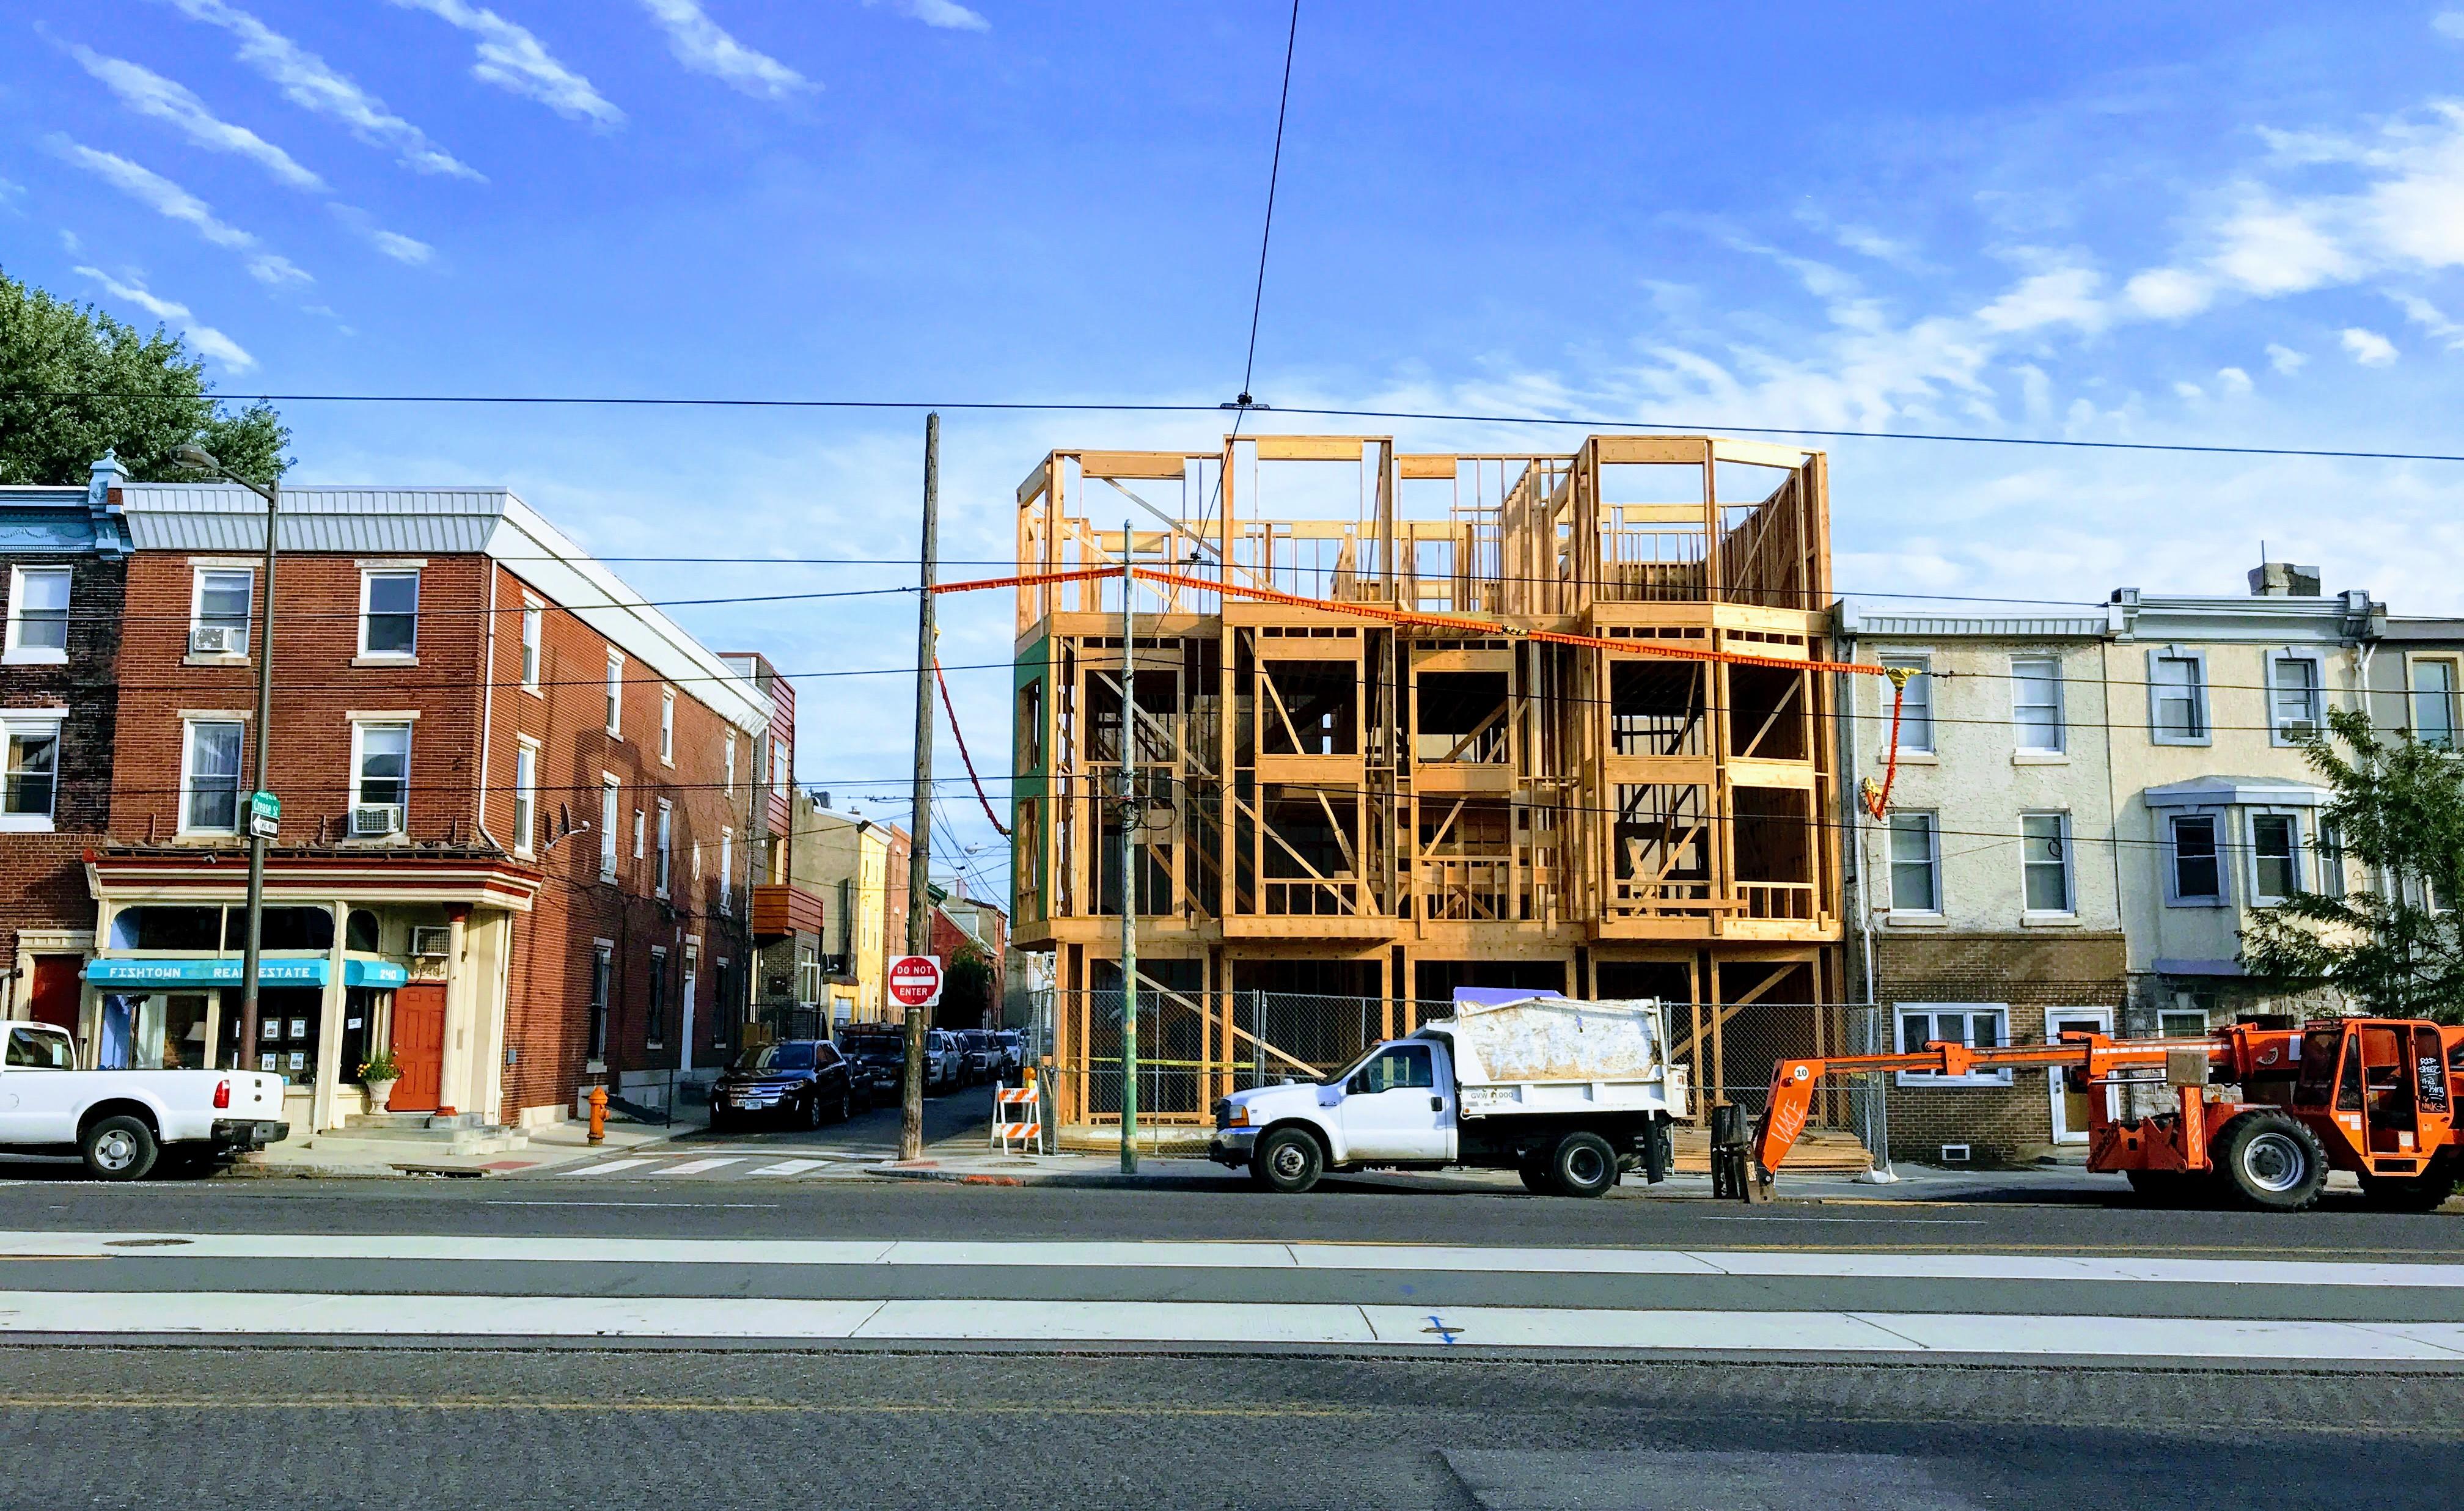 New construction underway on Girard Avenue in Fishtown.